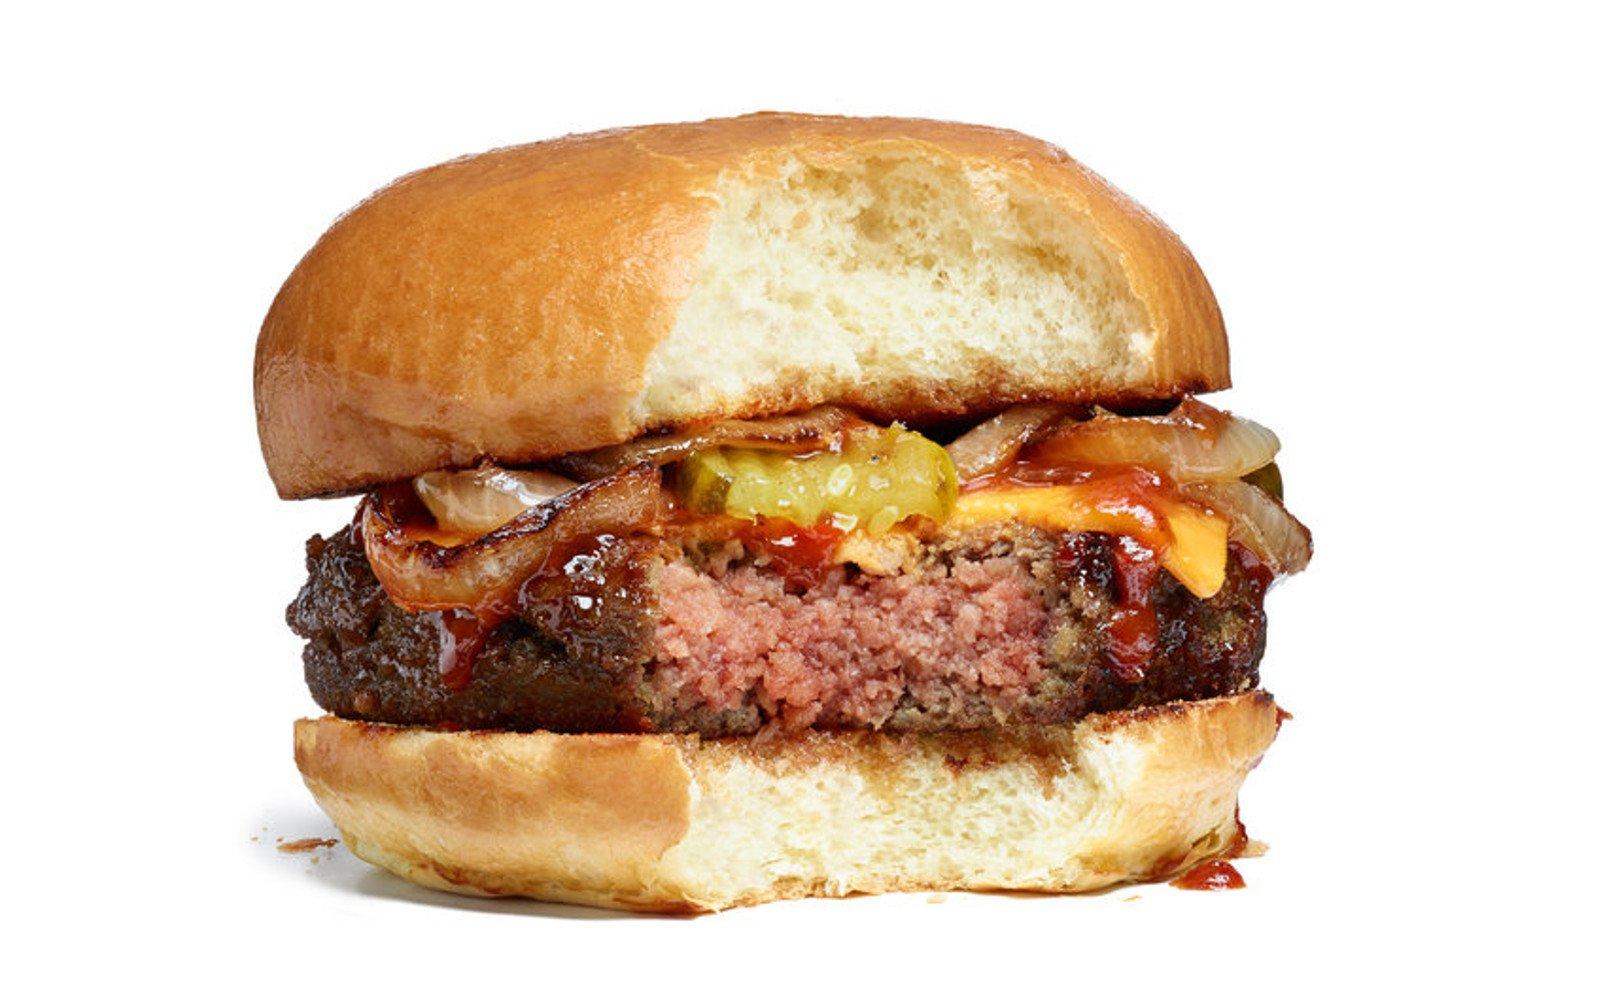 Gmo Impossible Burger Positive For Carcinogenic Glyphosate Moms Across America